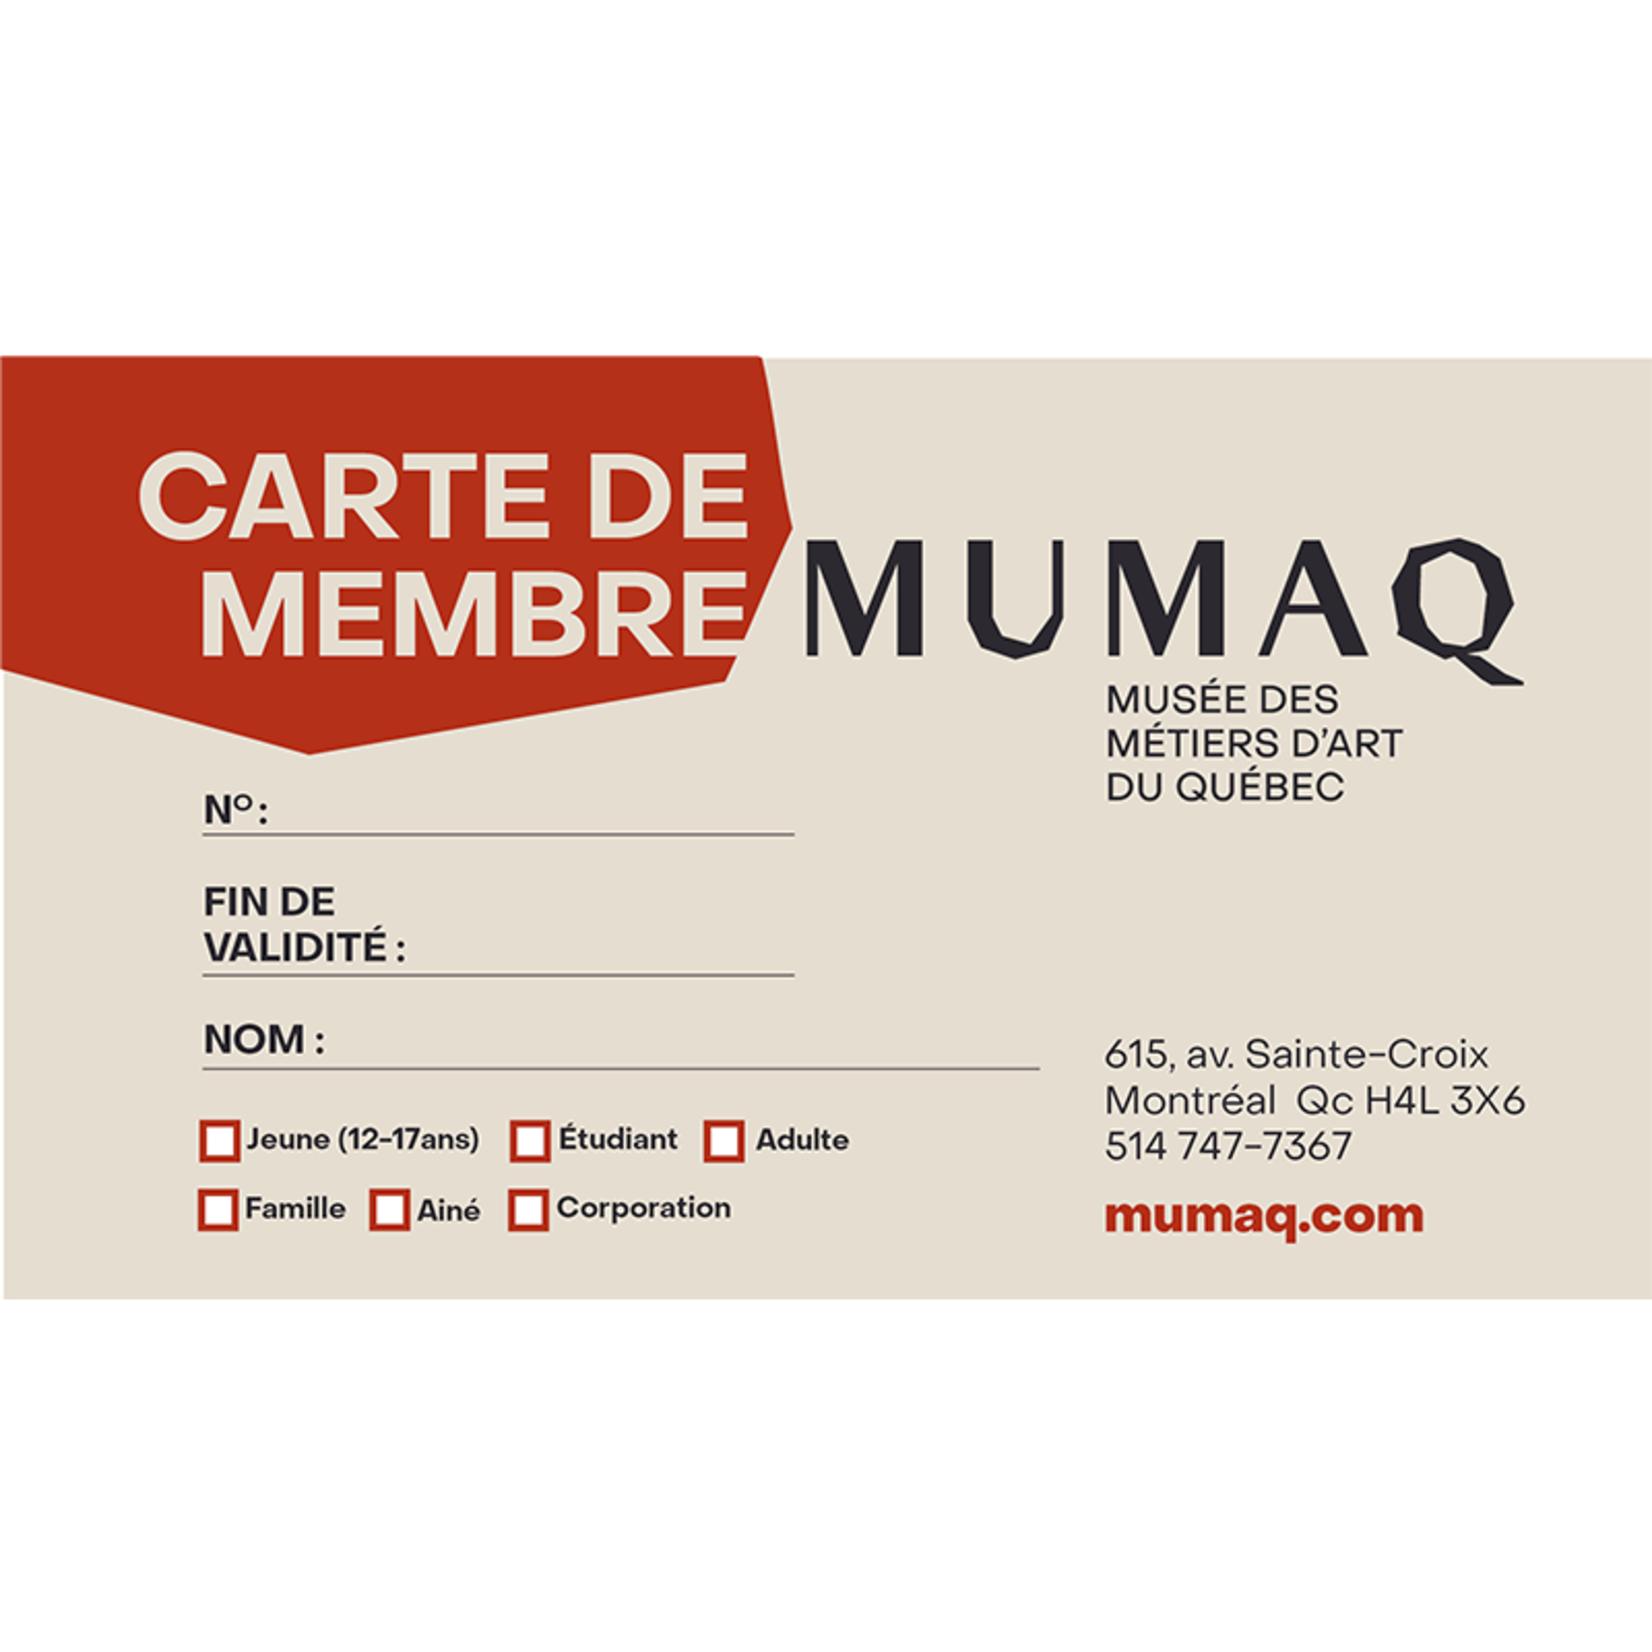 2 years membership card - Senior (65+)